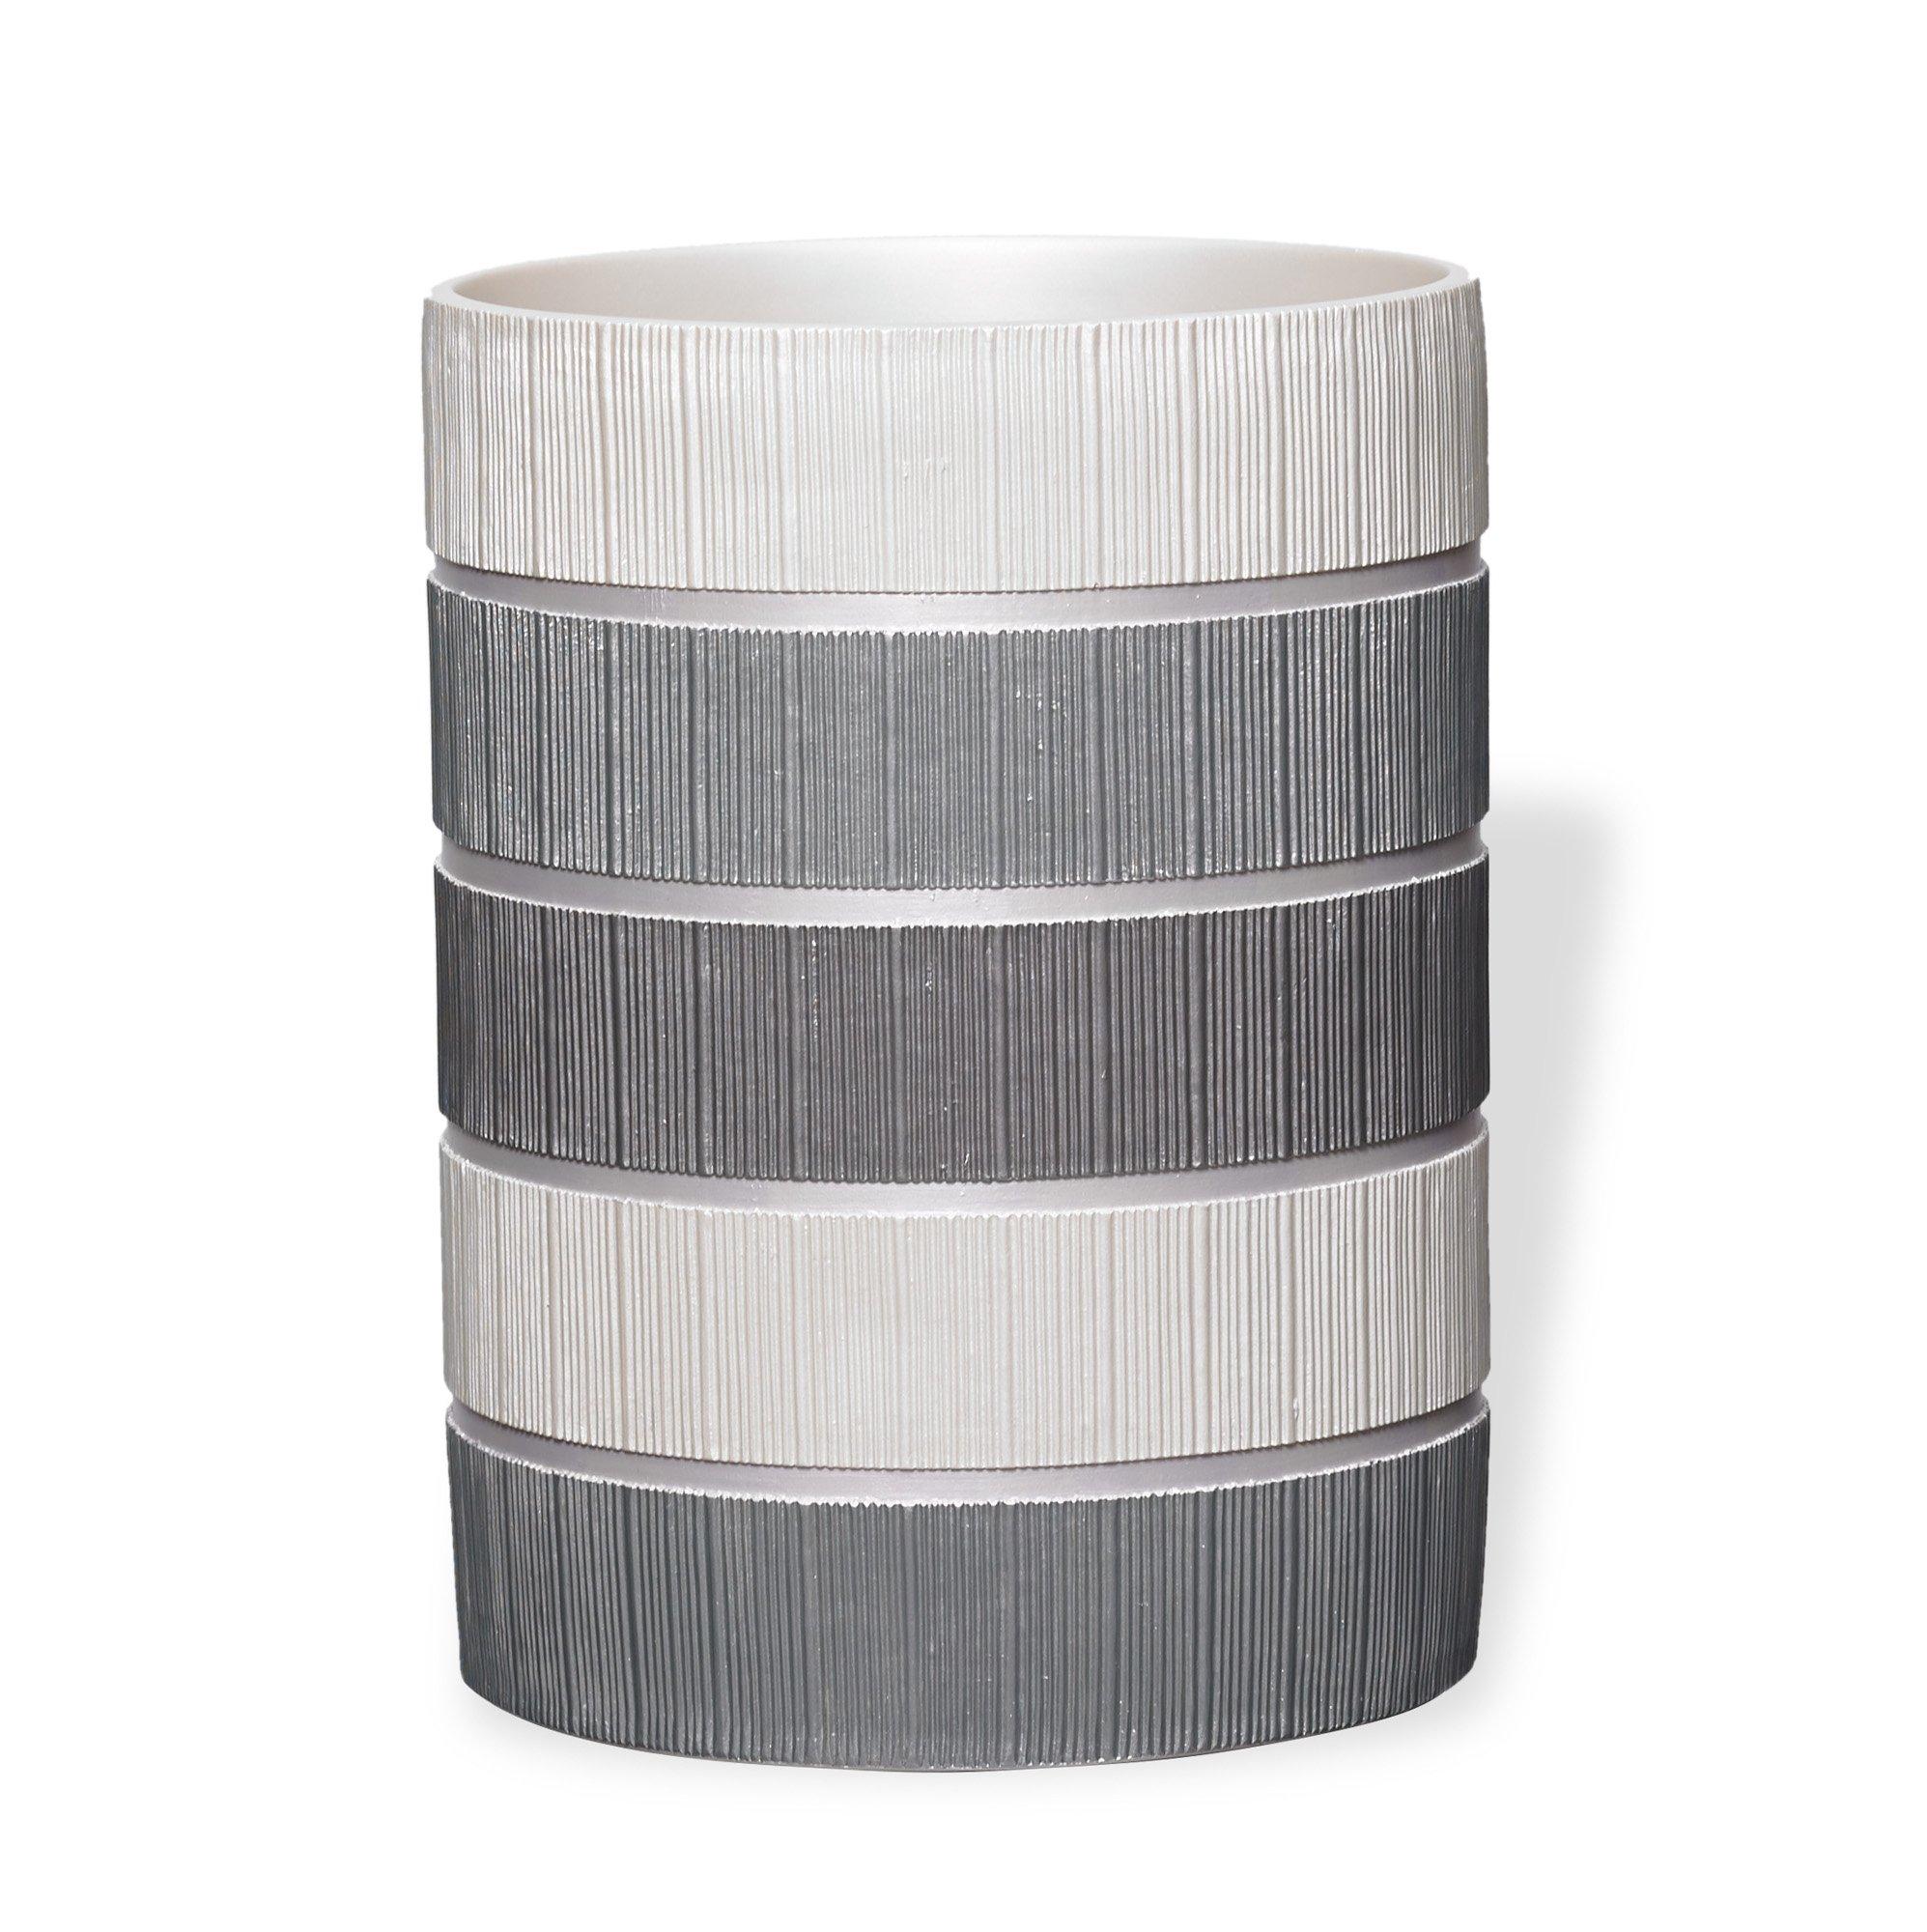 Popular Bath Waste Basket, Madern Collection, Grey